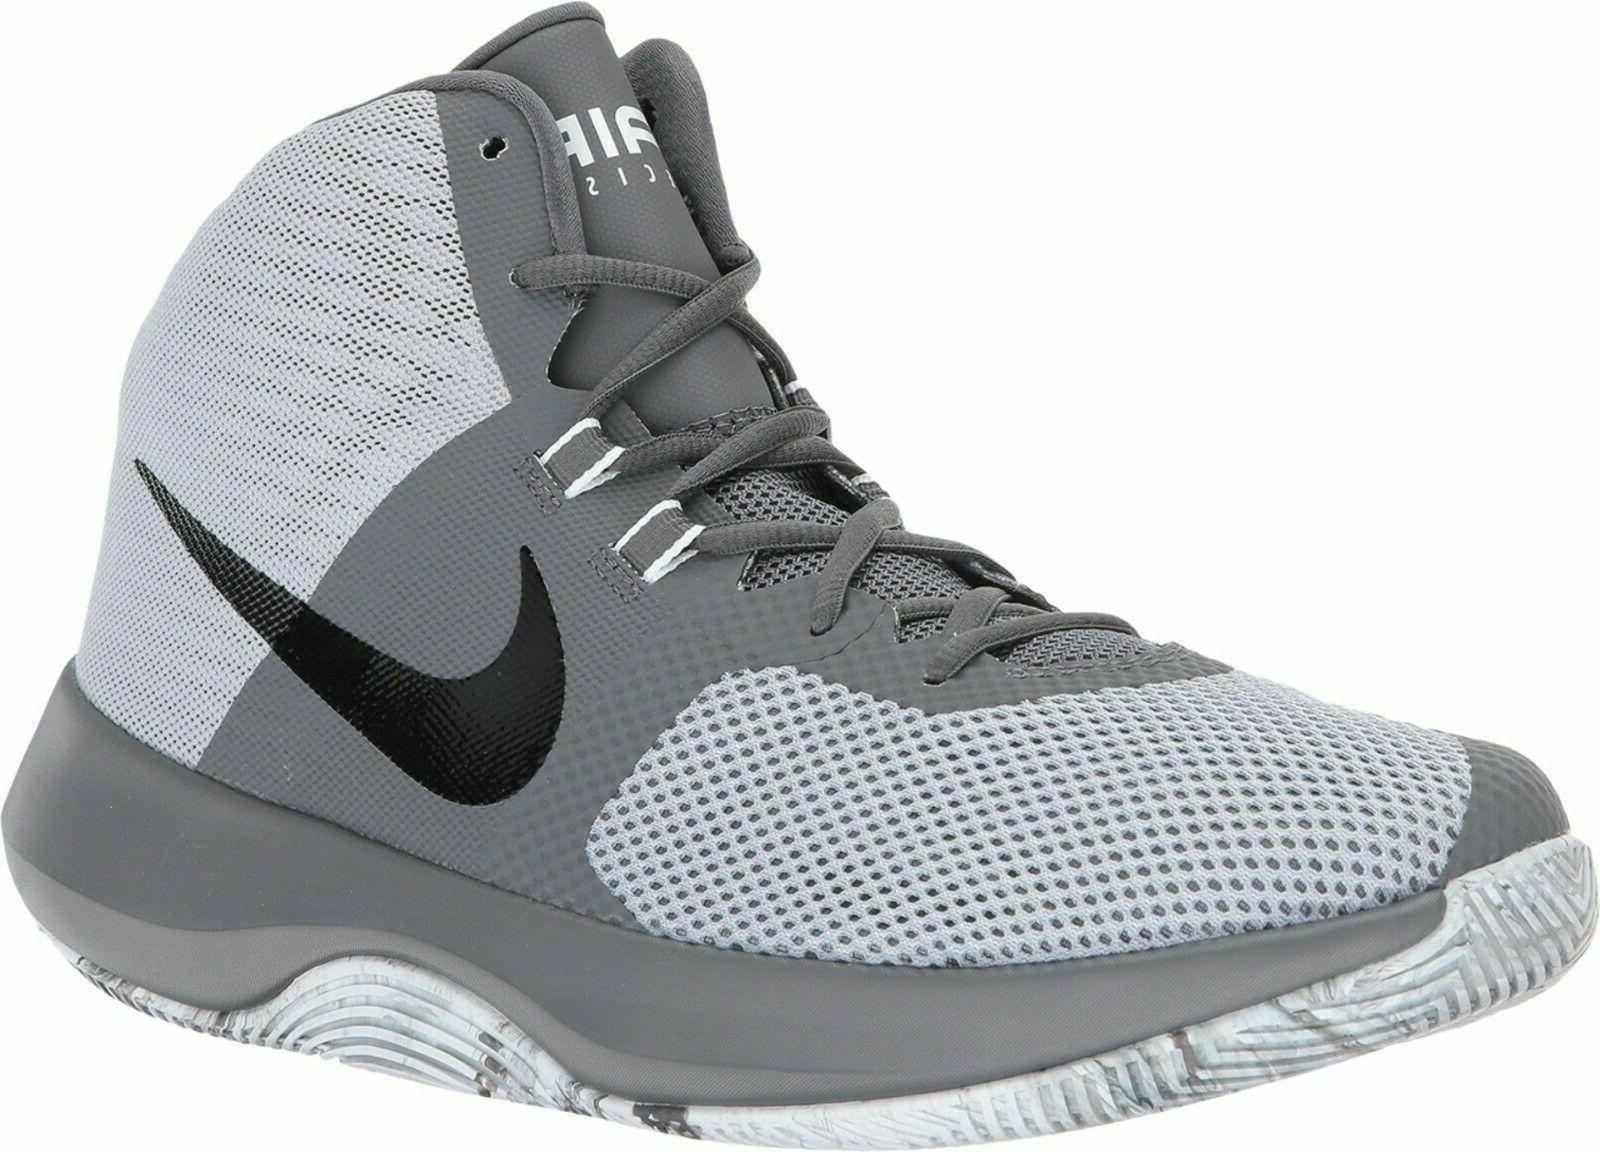 Nike Air Basketball Shoes 898455-004 Men's